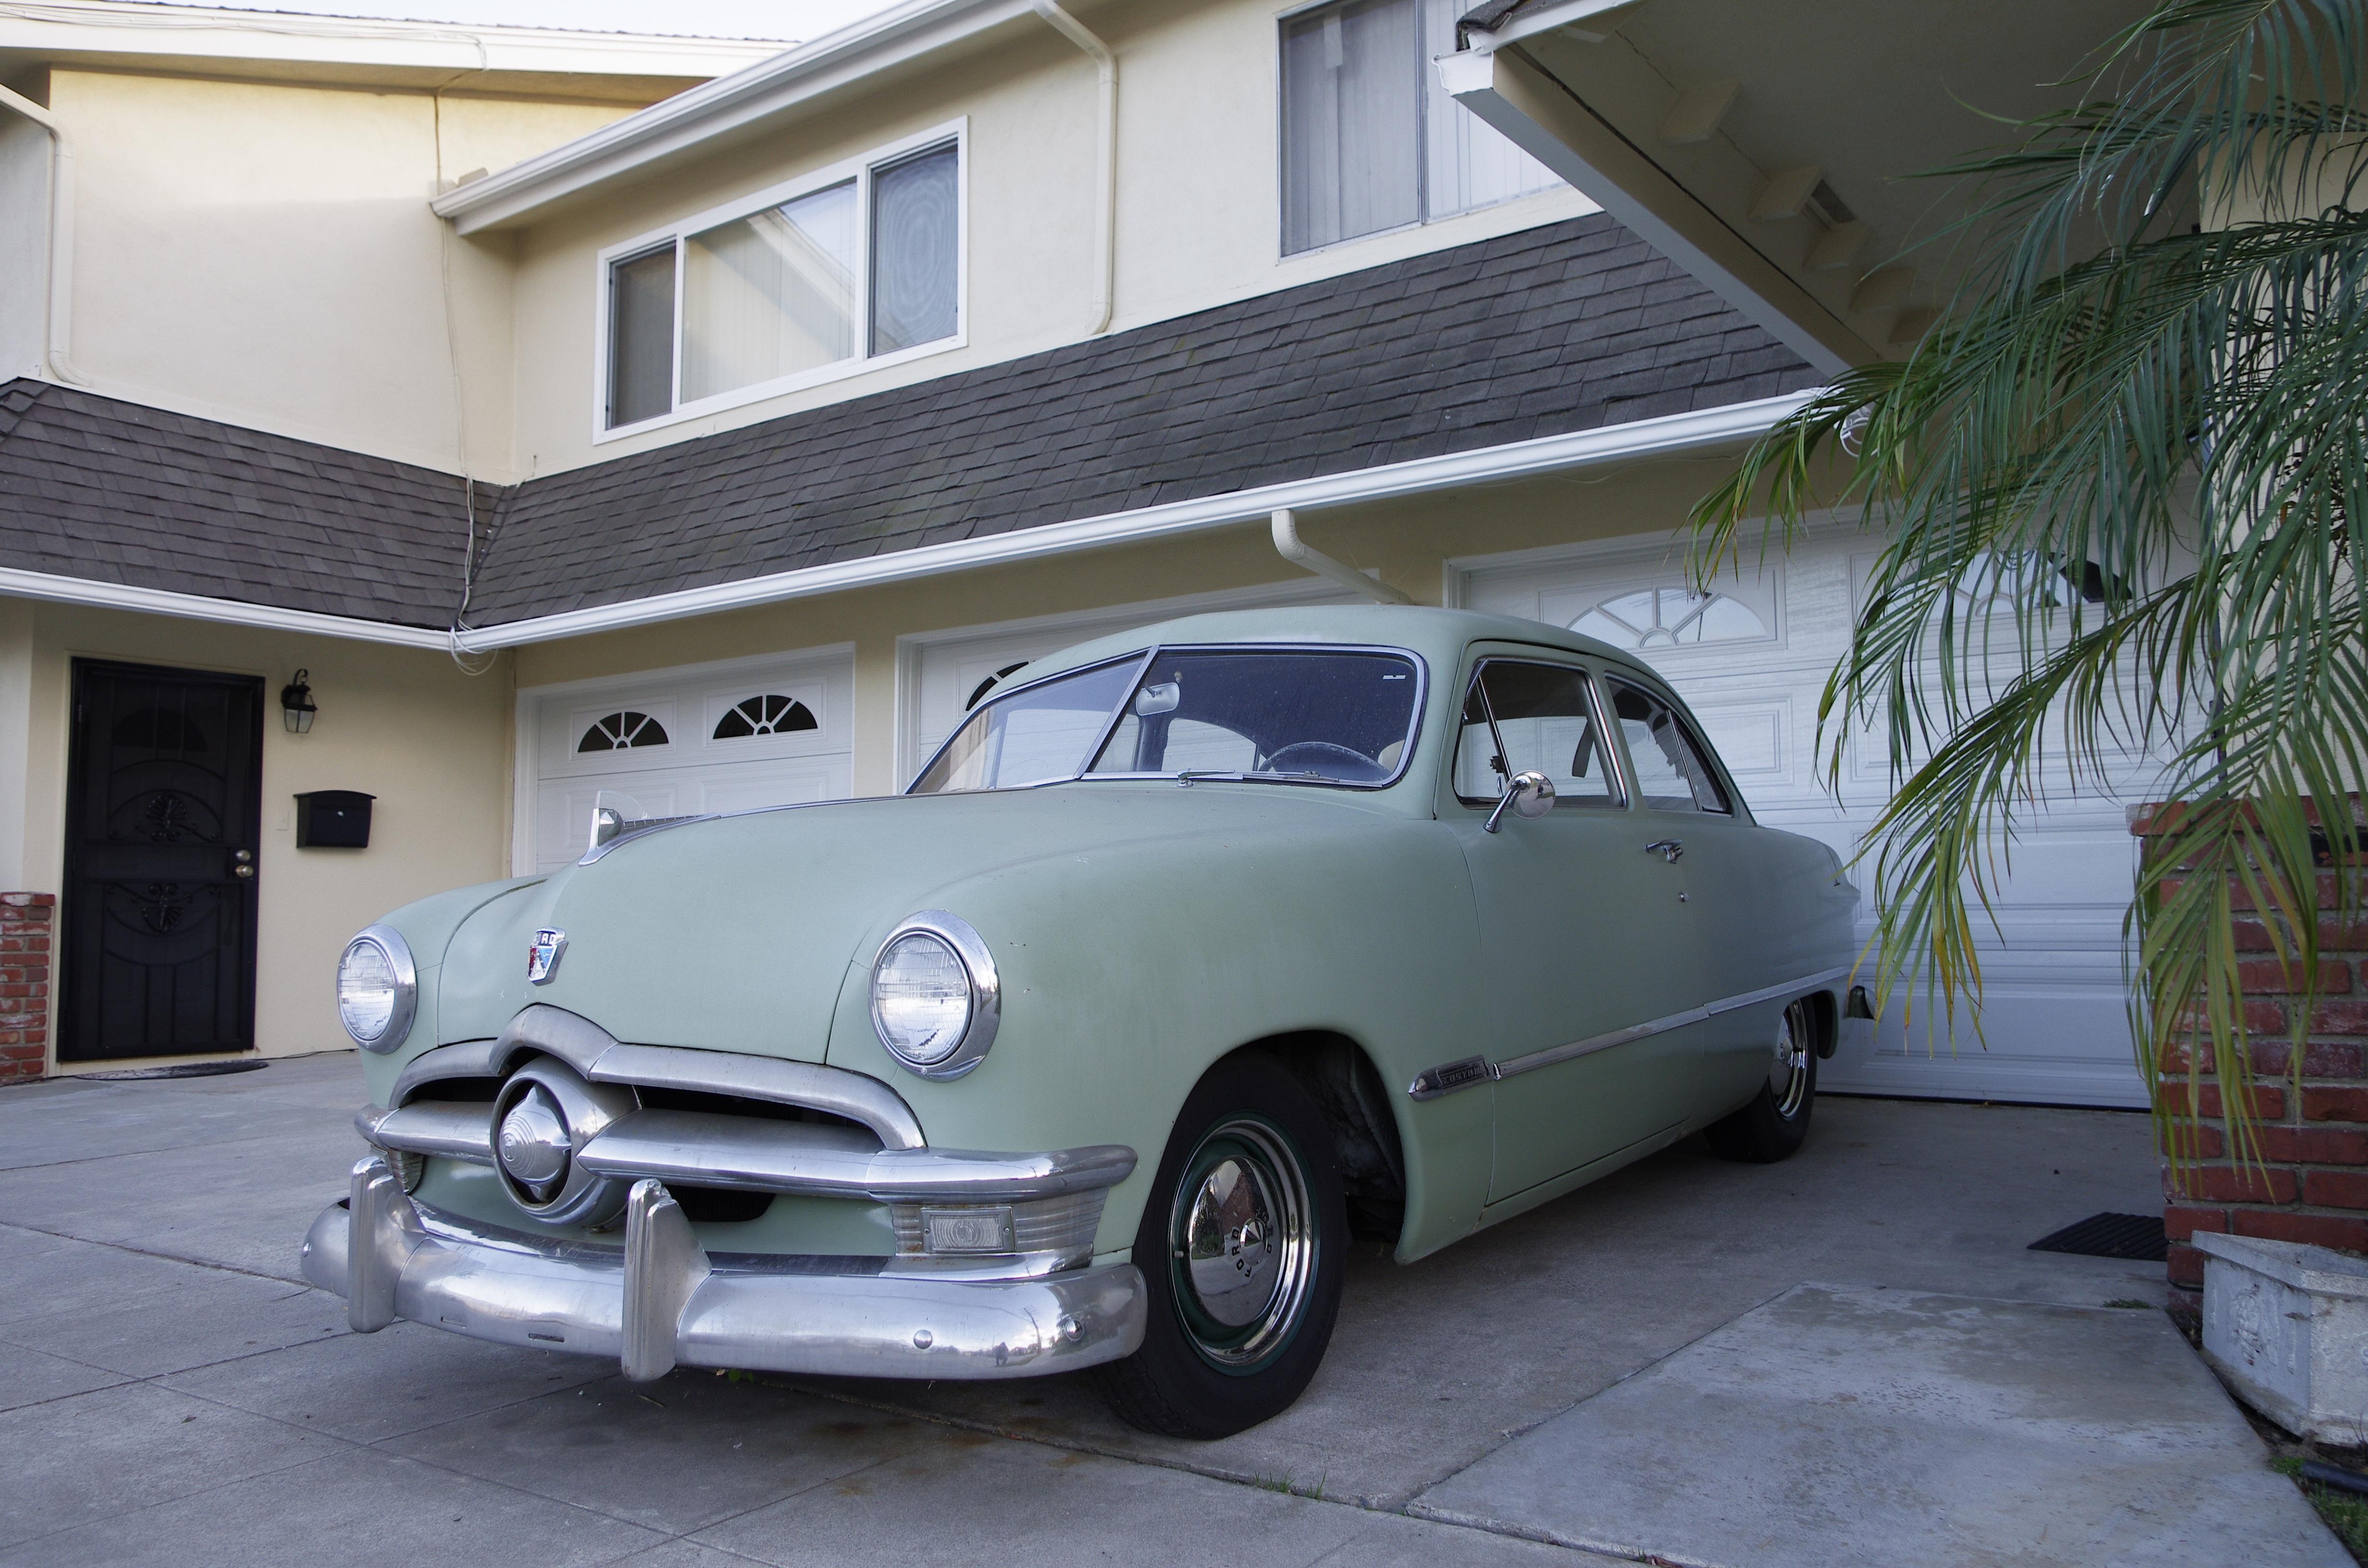 Free Images : california, classic car, motor vehicle, vintage car ...